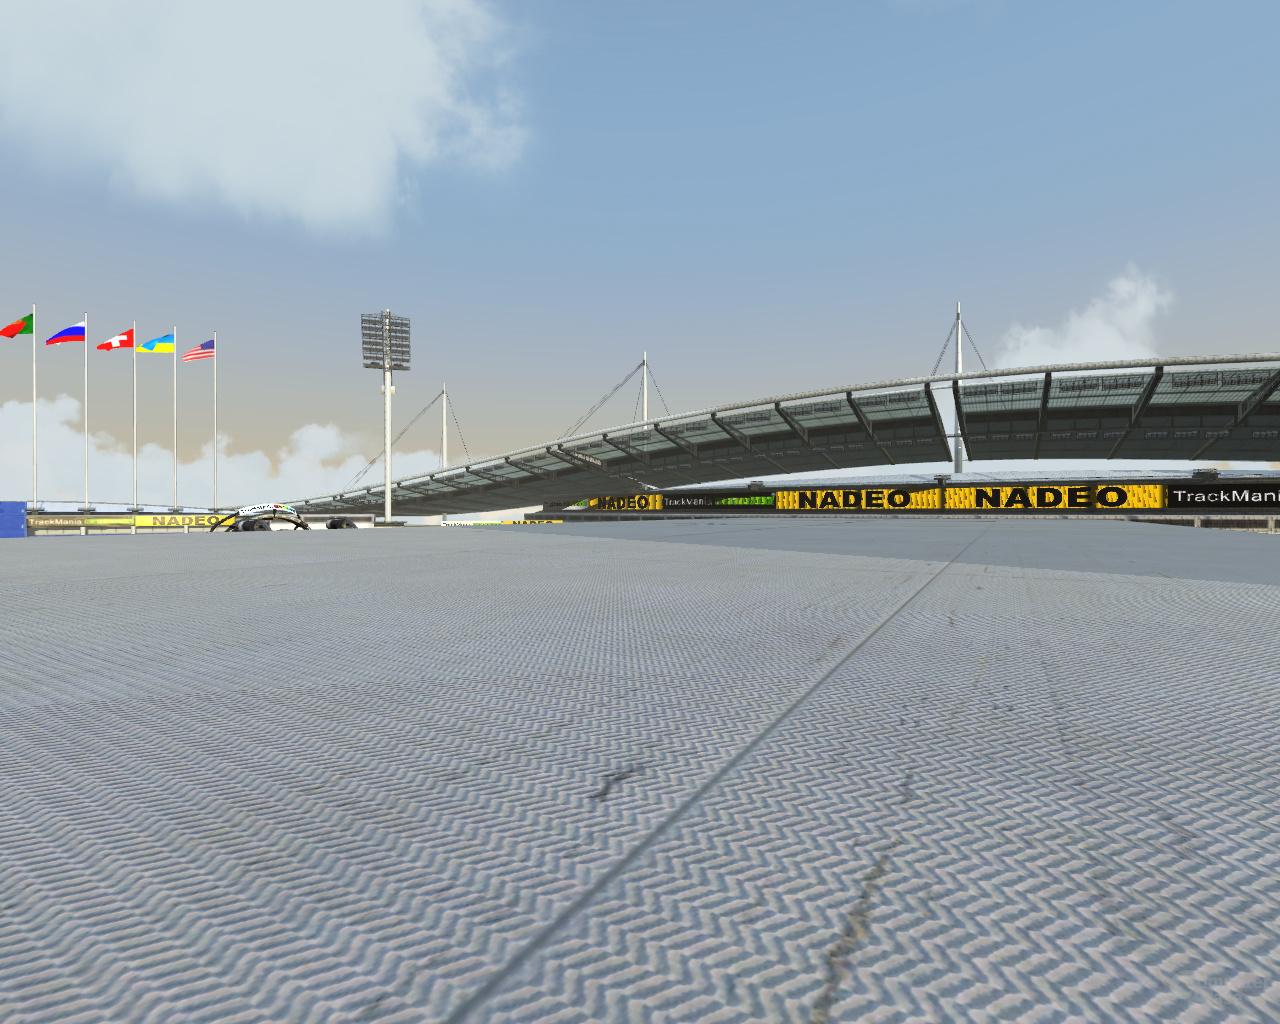 ATi RV870 Trackmania - 16xAF